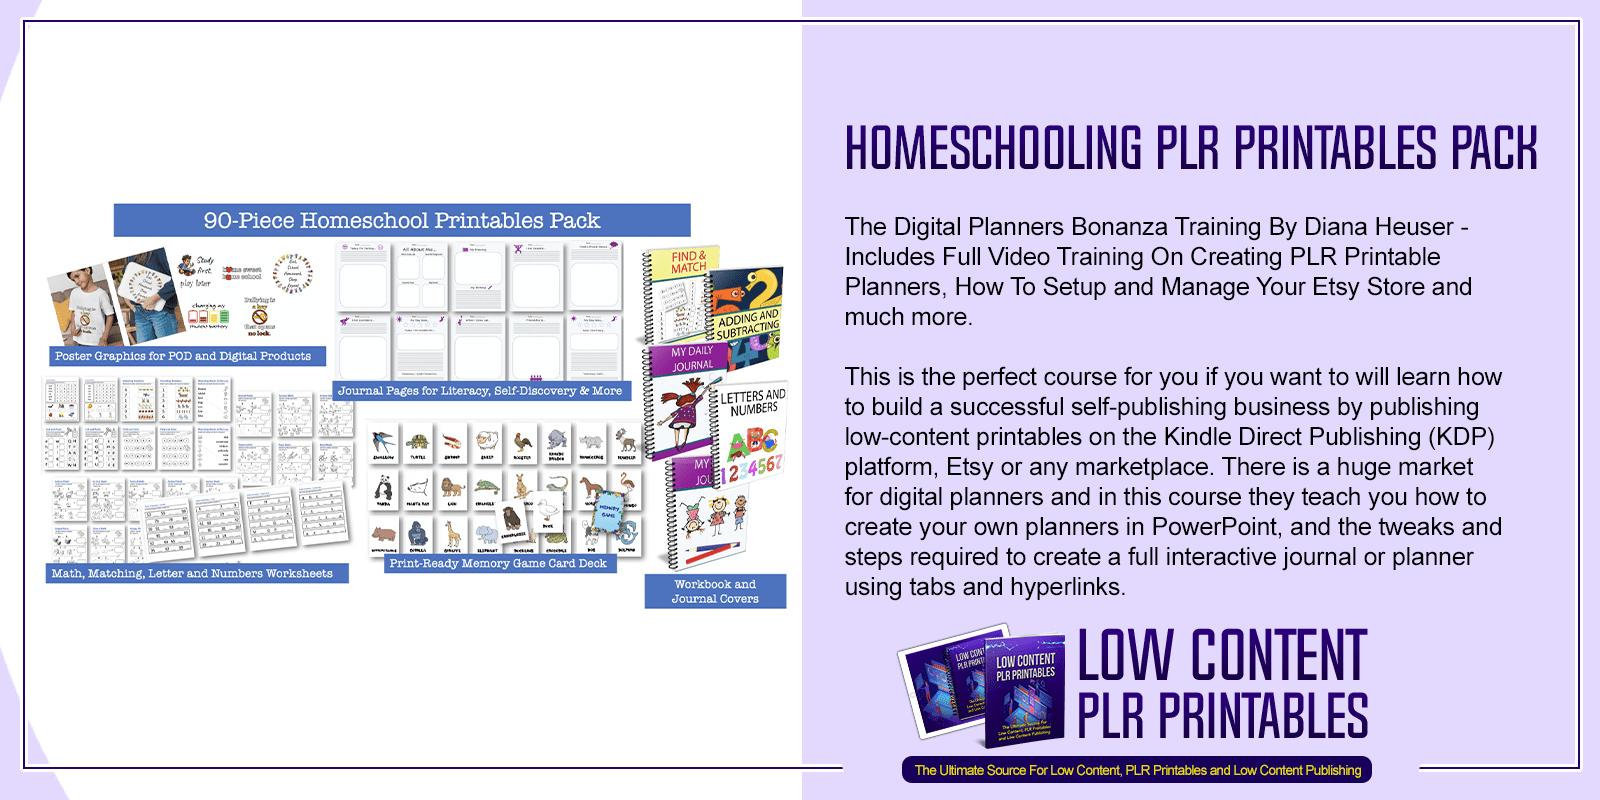 Homeschooling PLR Printables Pack